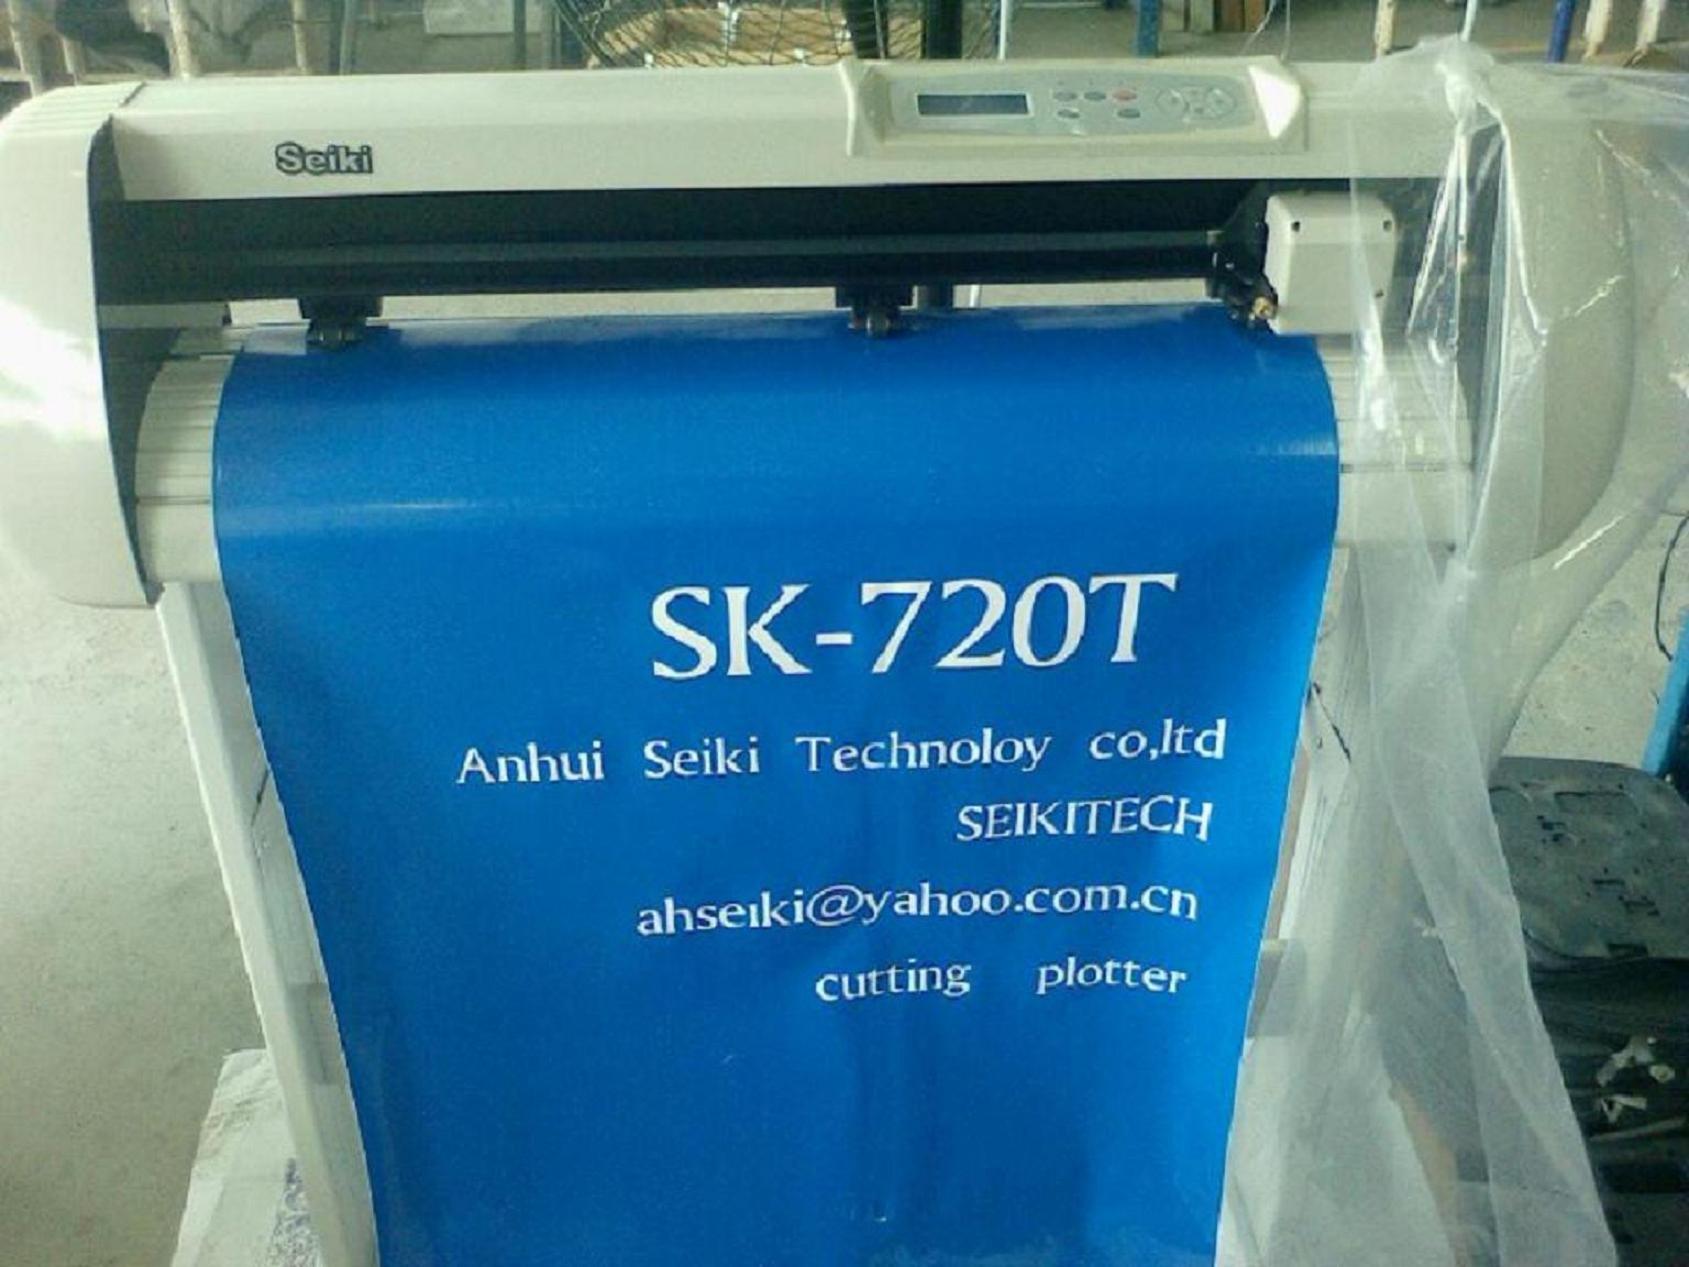 vinyl cutter SK-720T(China (Mainland))